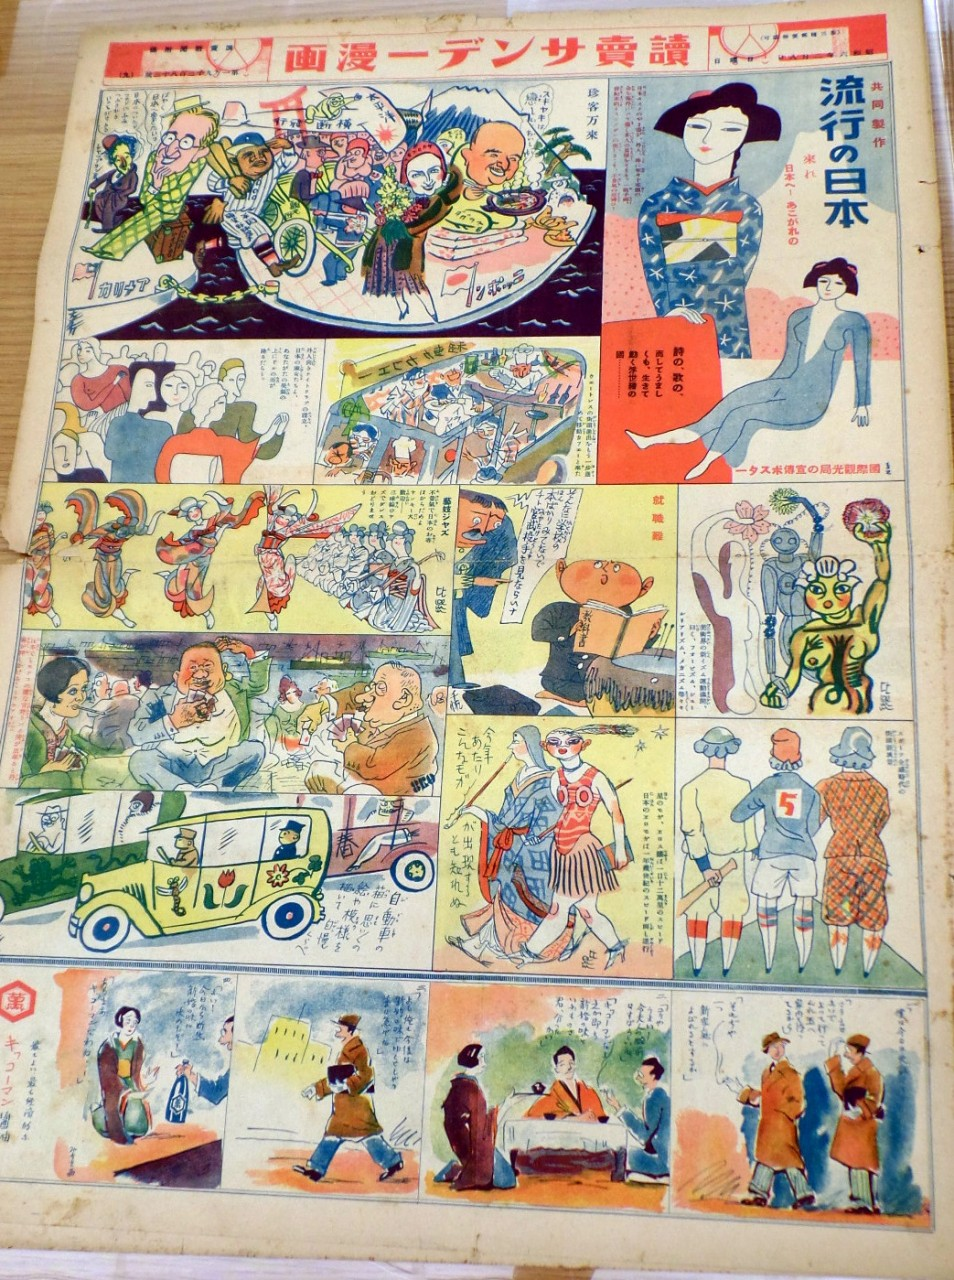 Yamiuri Sande manga (Sunday newspaper comics from Japan, 1930s)